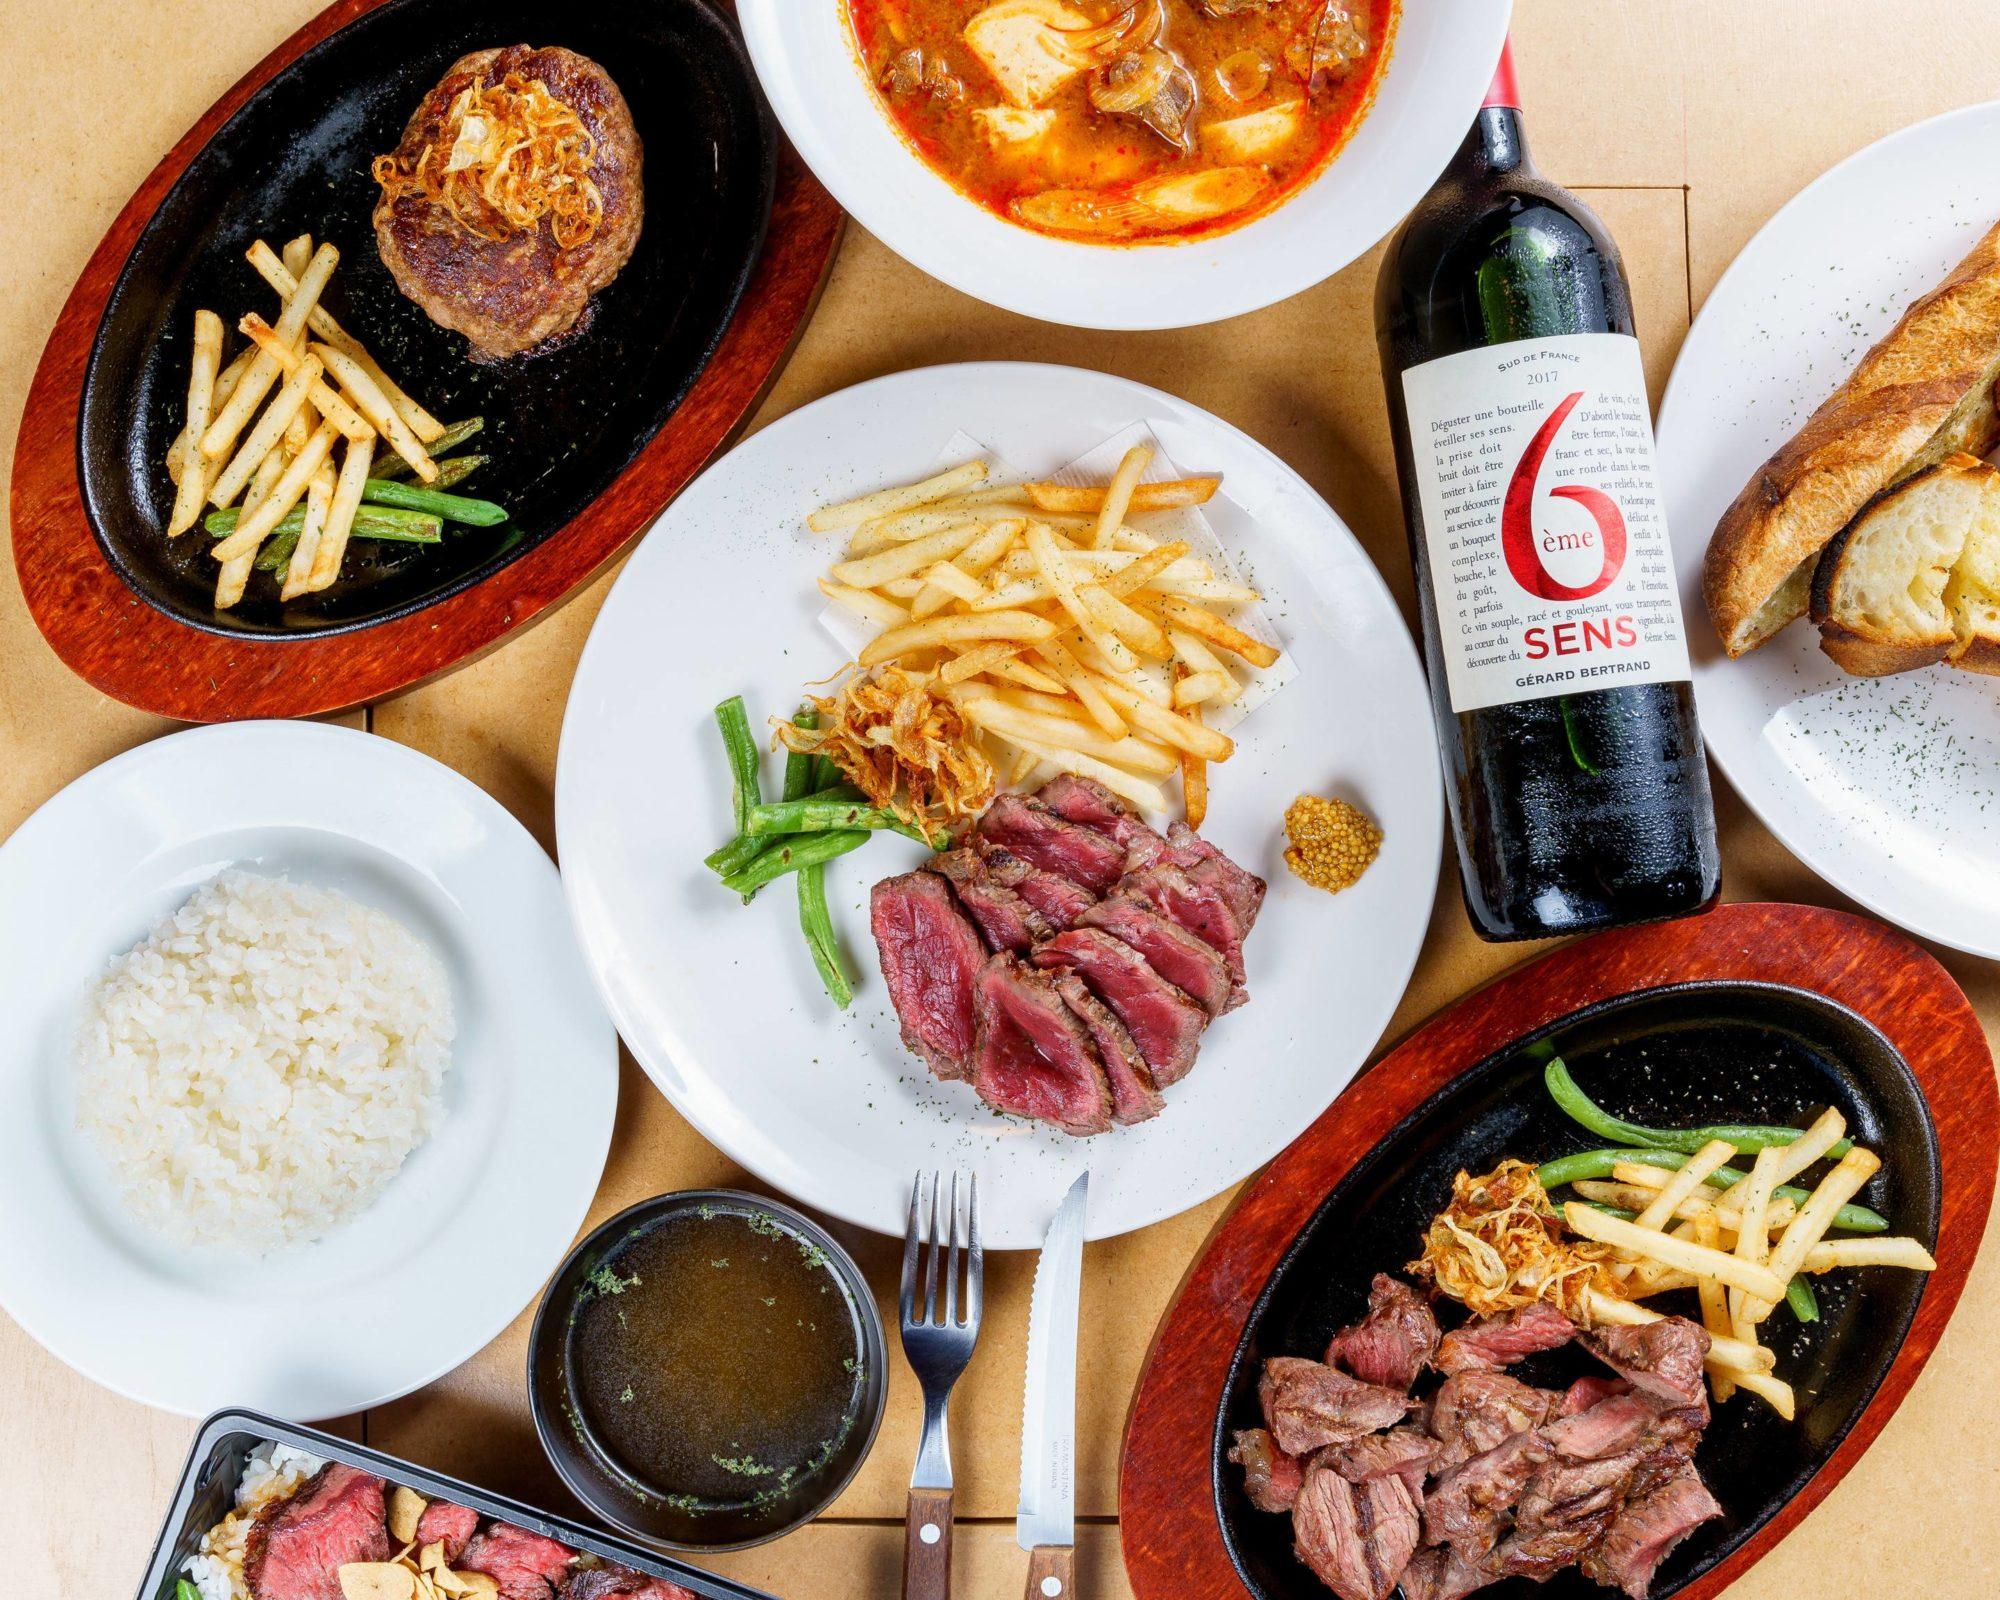 Uber Eats福岡の肉料理ランキング!おすすめ人気店5選